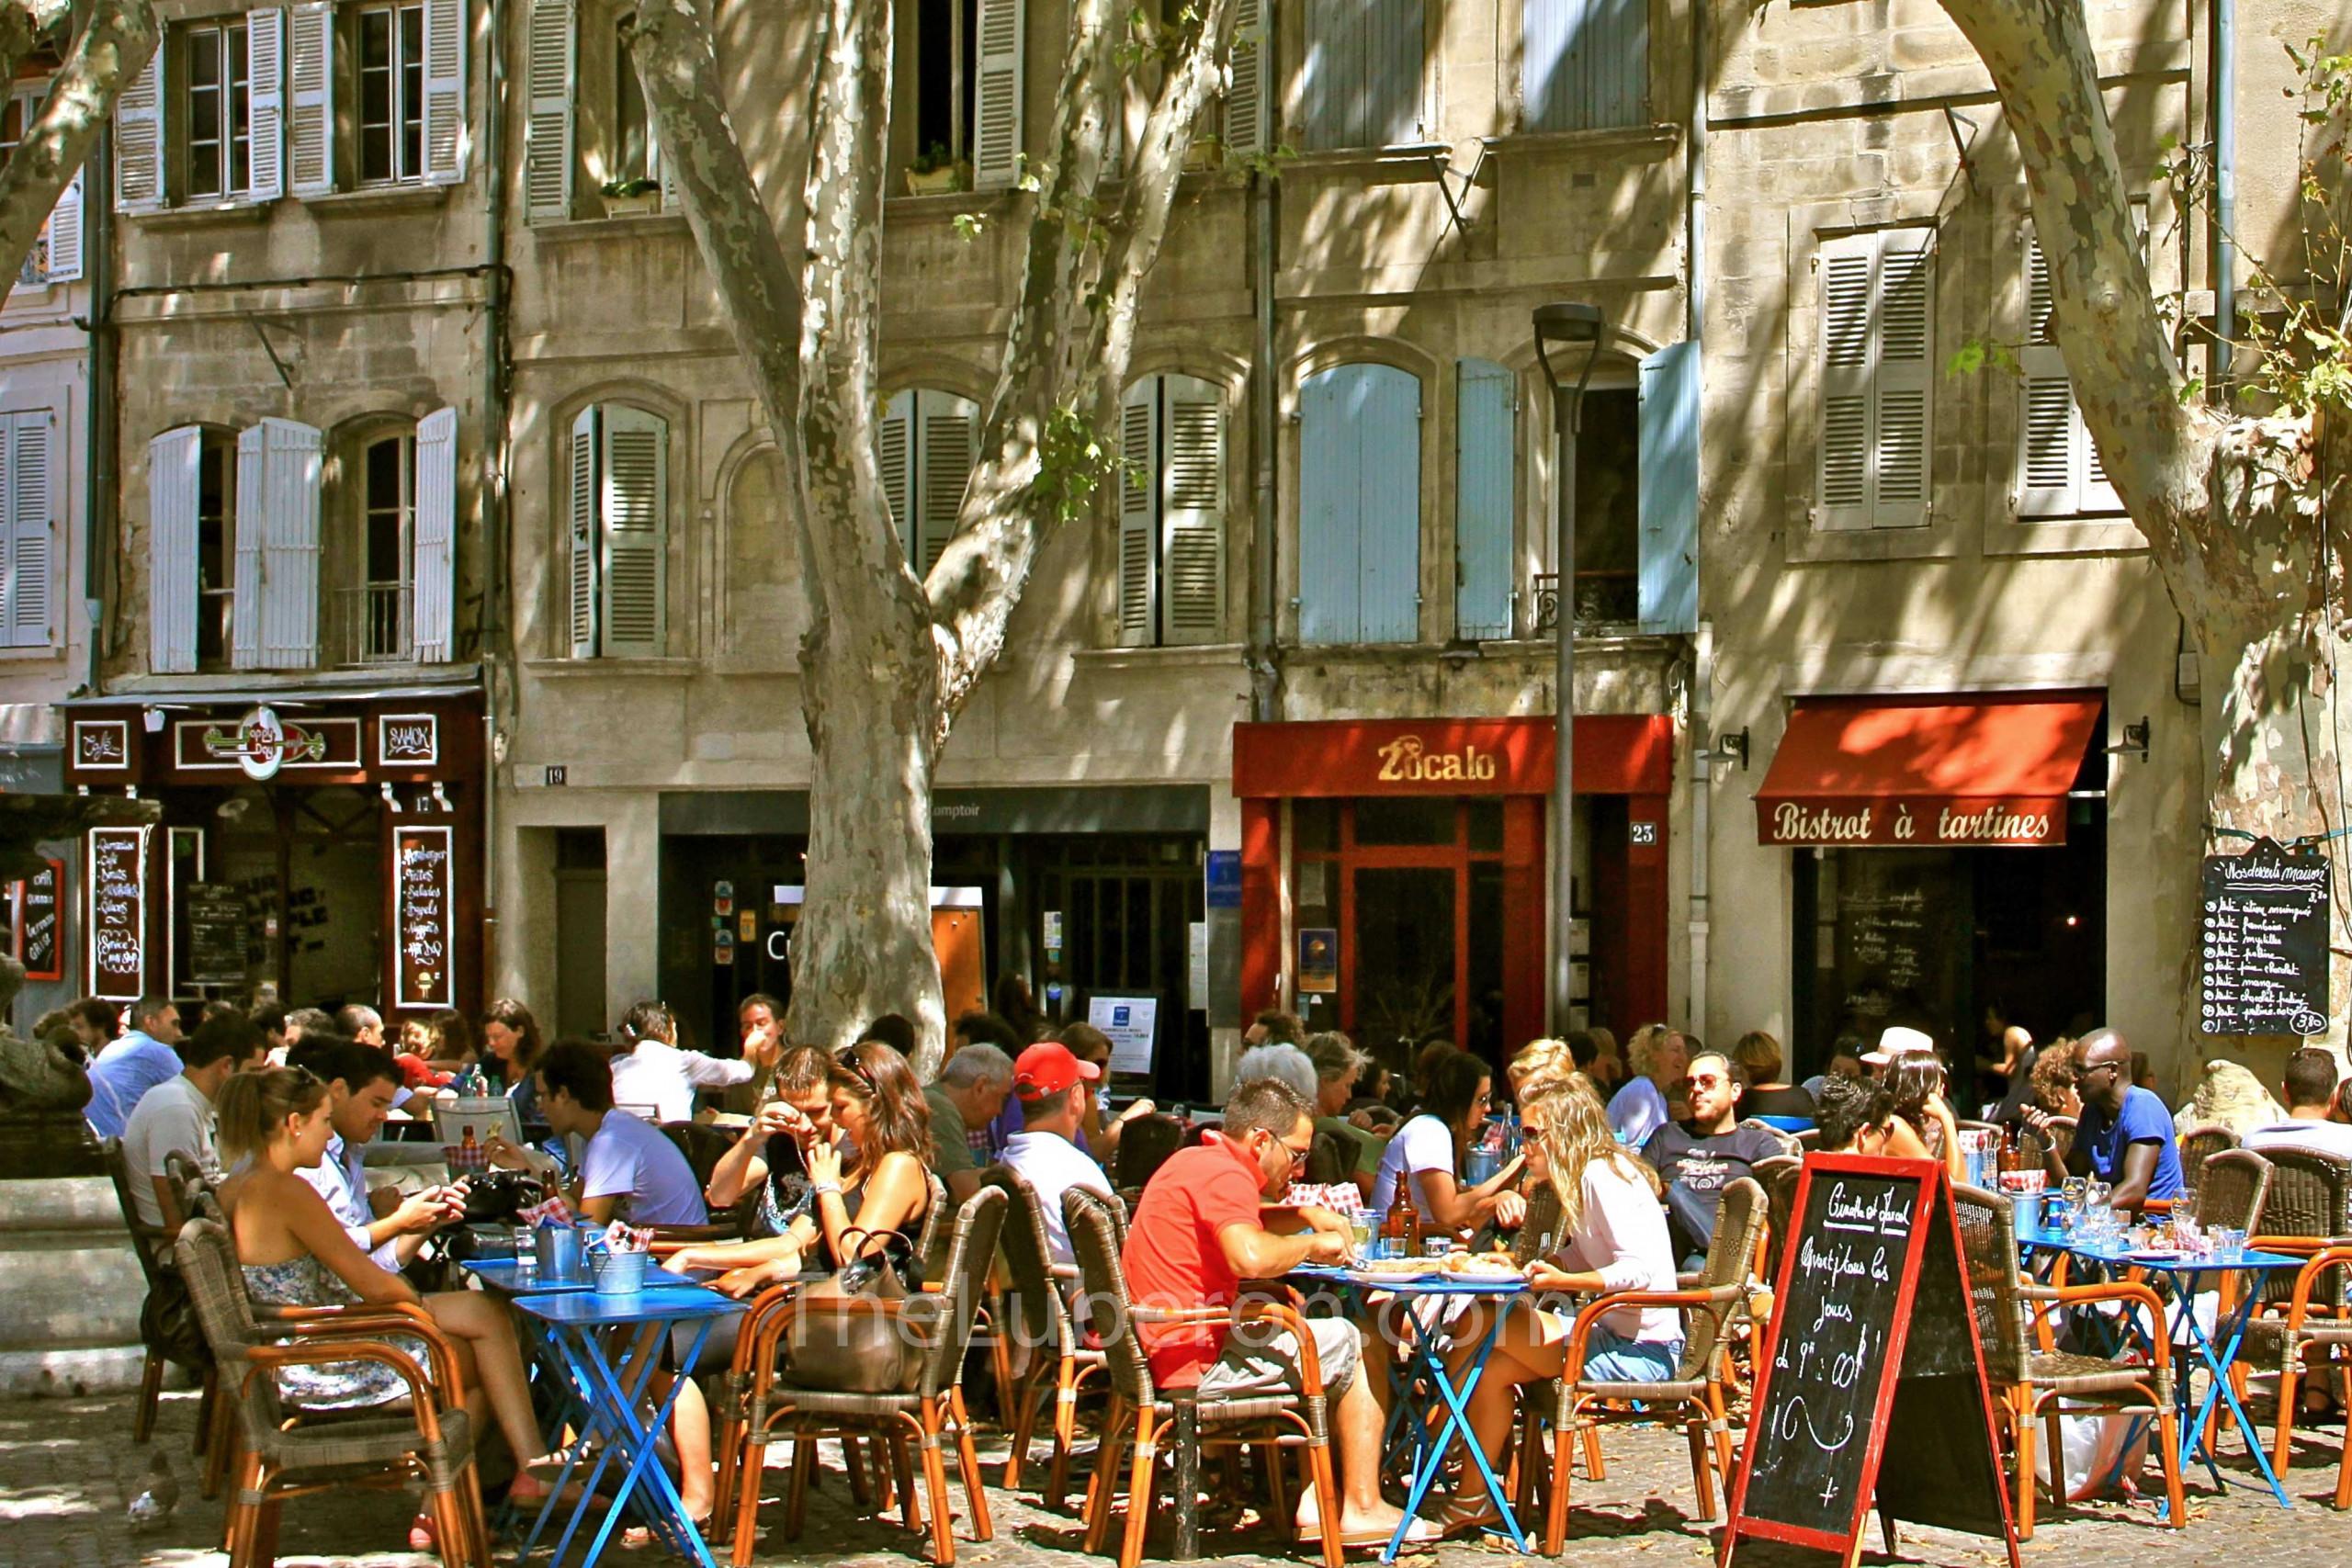 Lunch in Avignon